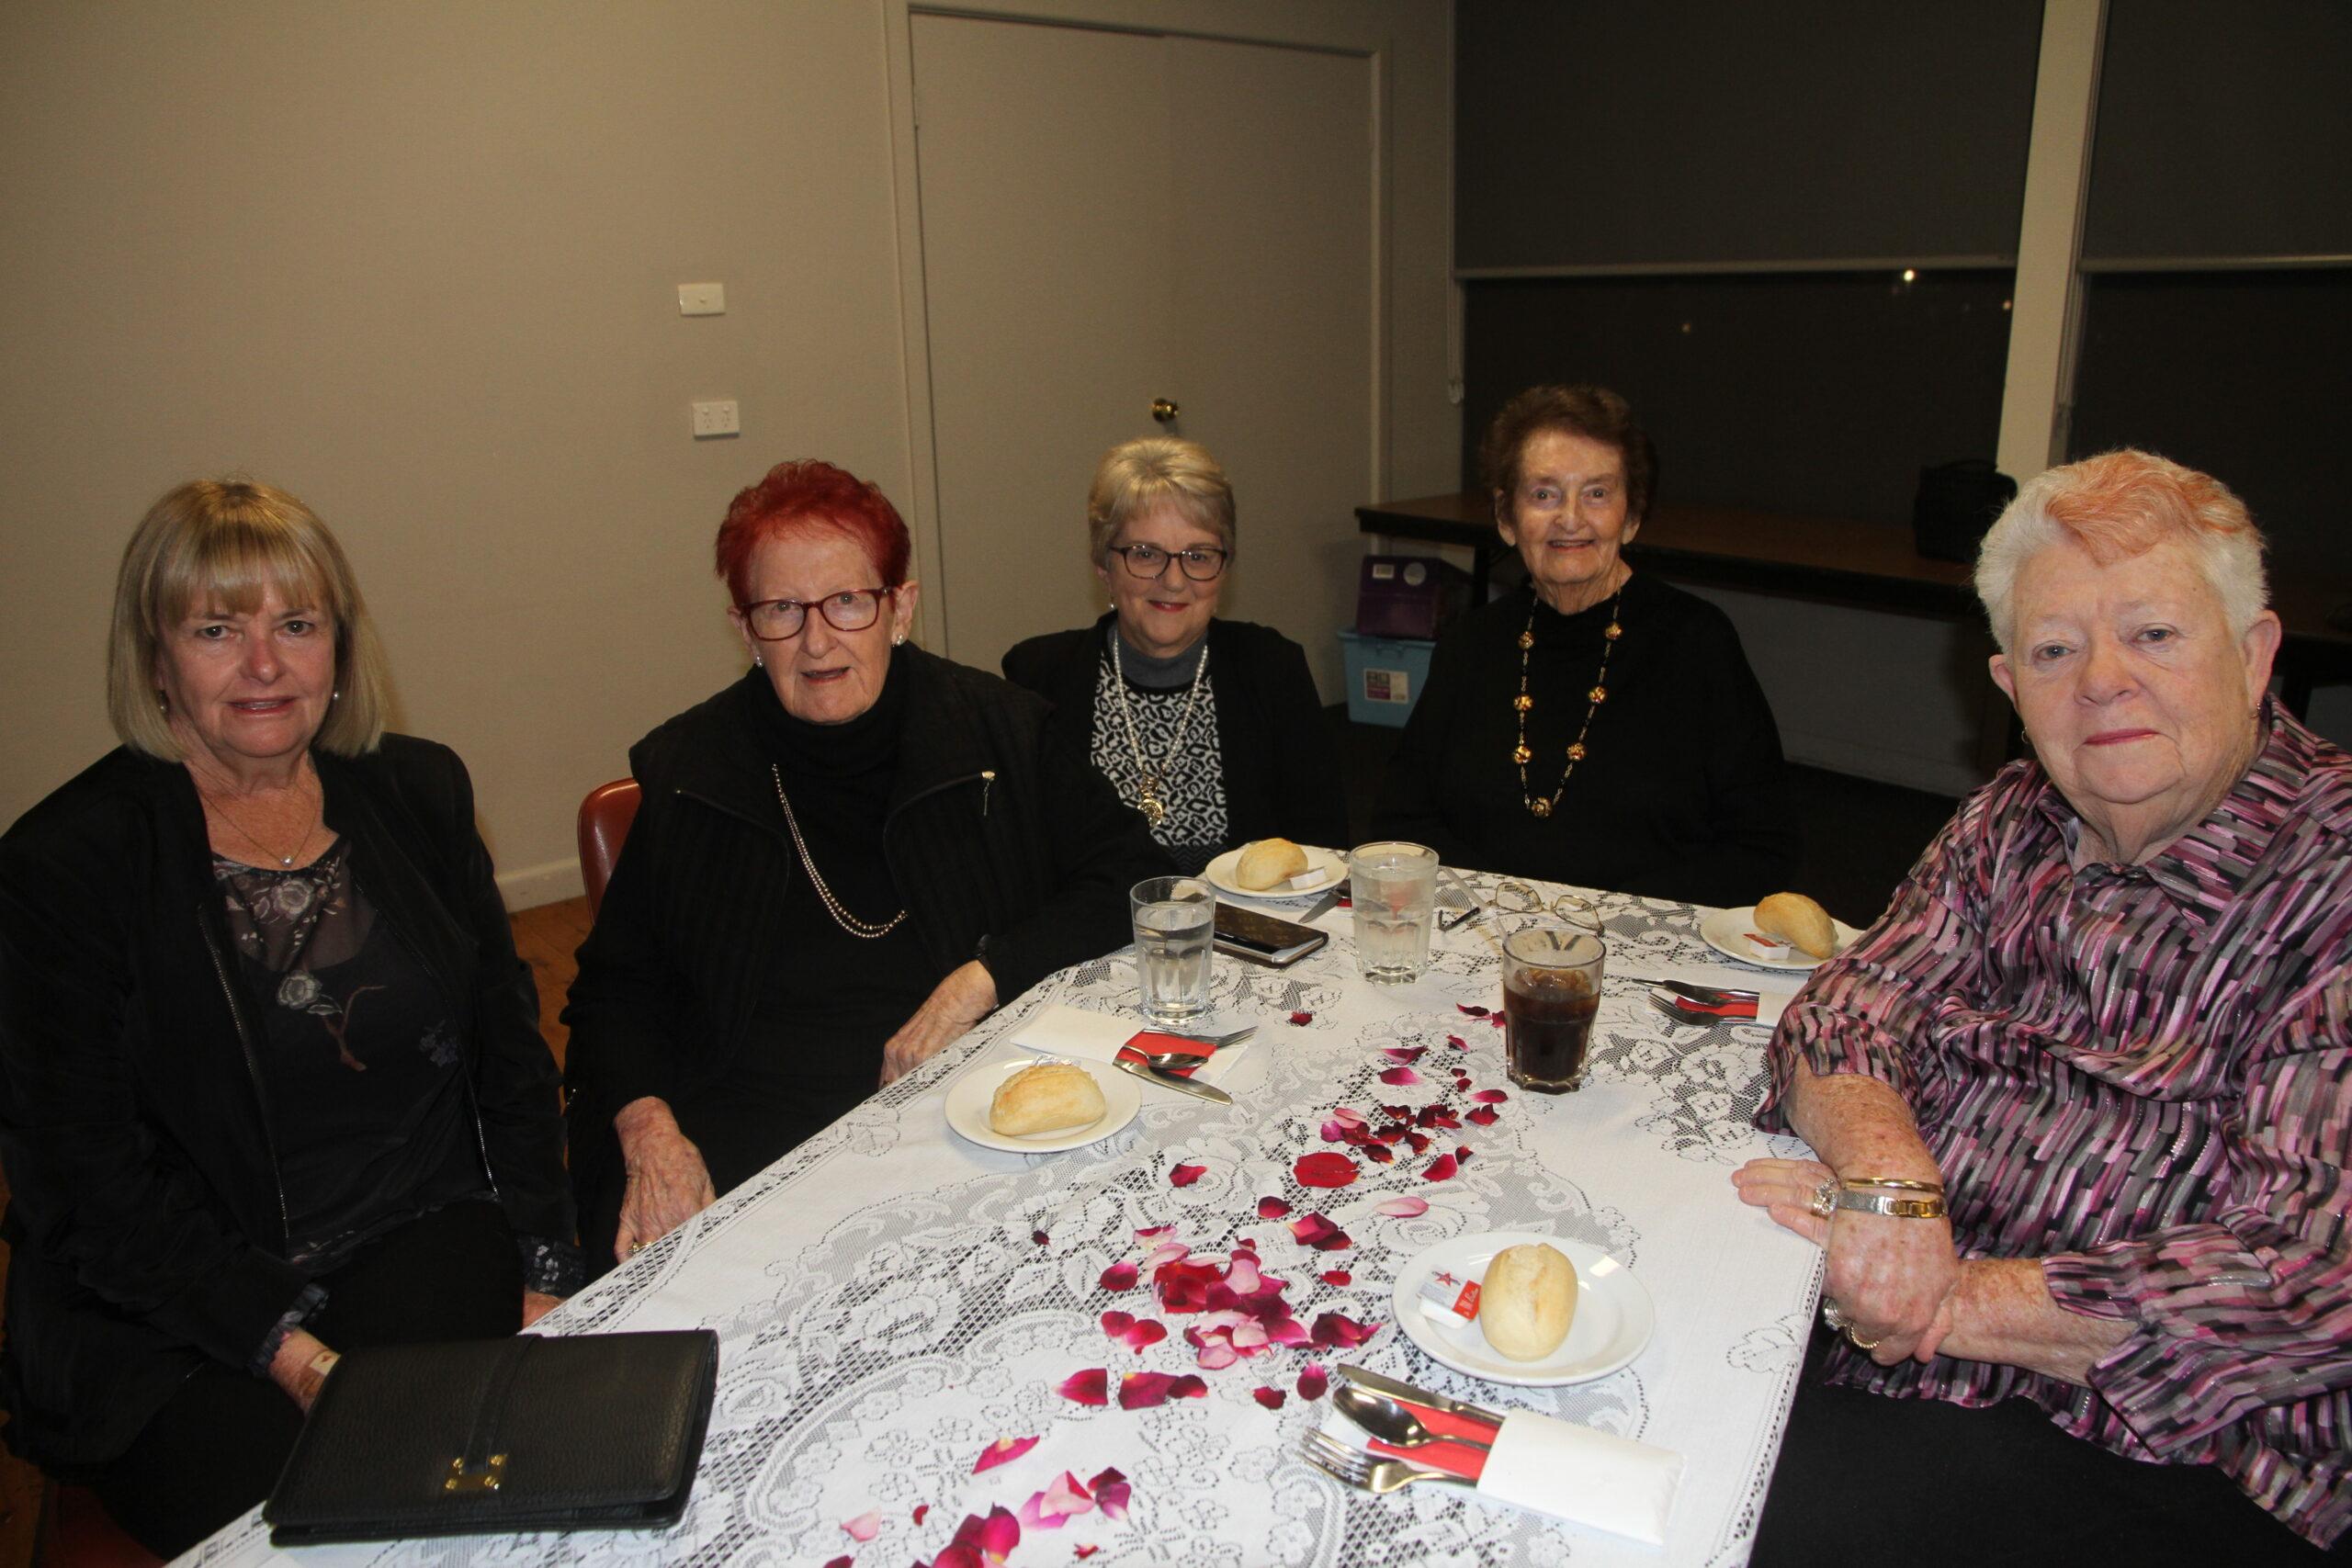 Lesley Anderson, Barb McNamara, Janet Baylis, Nola McNamara and Betty Large.